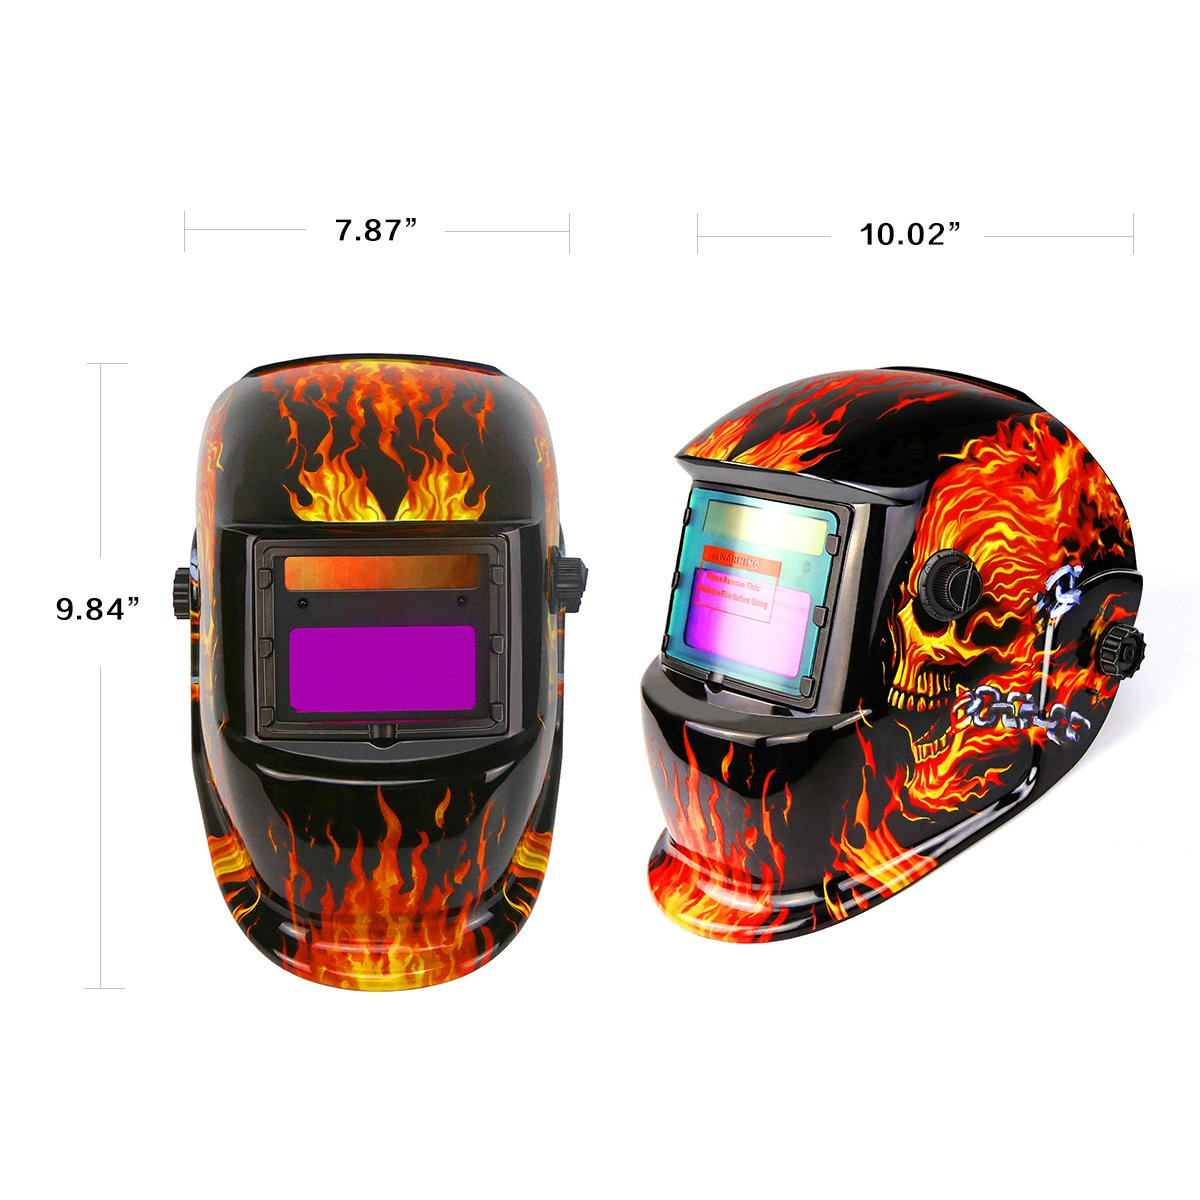 Solar Powered Welding Helmet Auto Darkening Professional Hood with Wide Lens Adjustable Shade Range by DEKOPRO (Image #6)